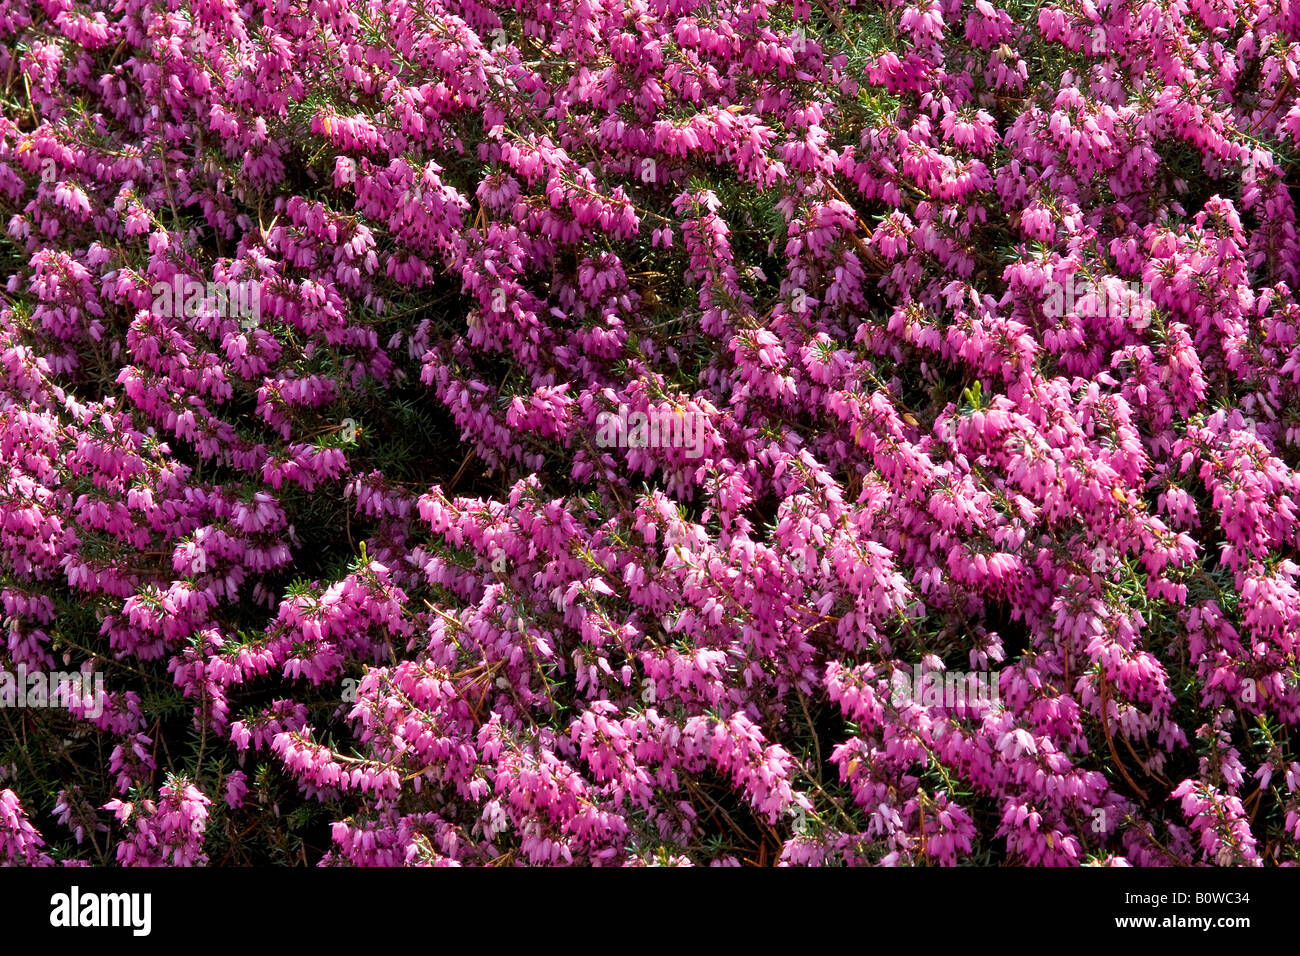 Flowering Winter Heath (Erica carnea), March Seedling cultivar - Stock Image